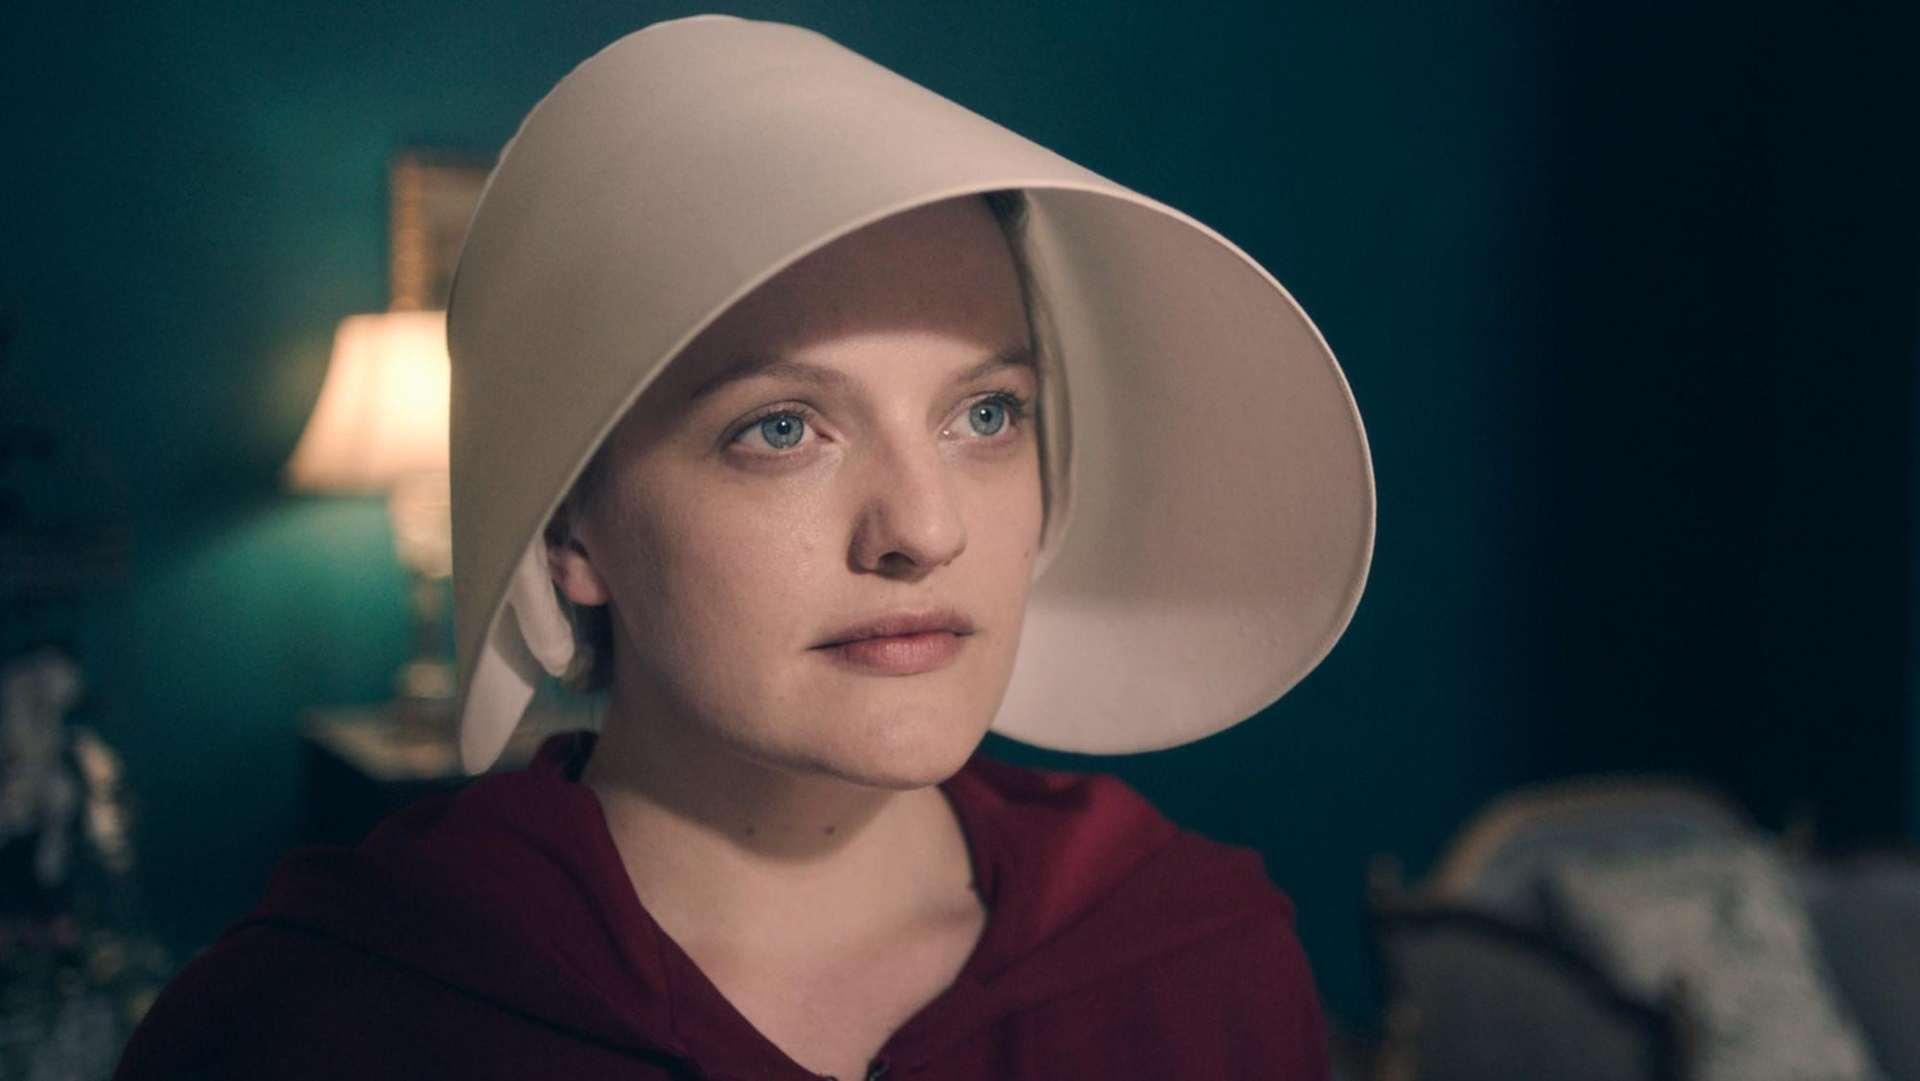 Кадры из фильма Рассказ служанки The Handmaid's Tale 2017